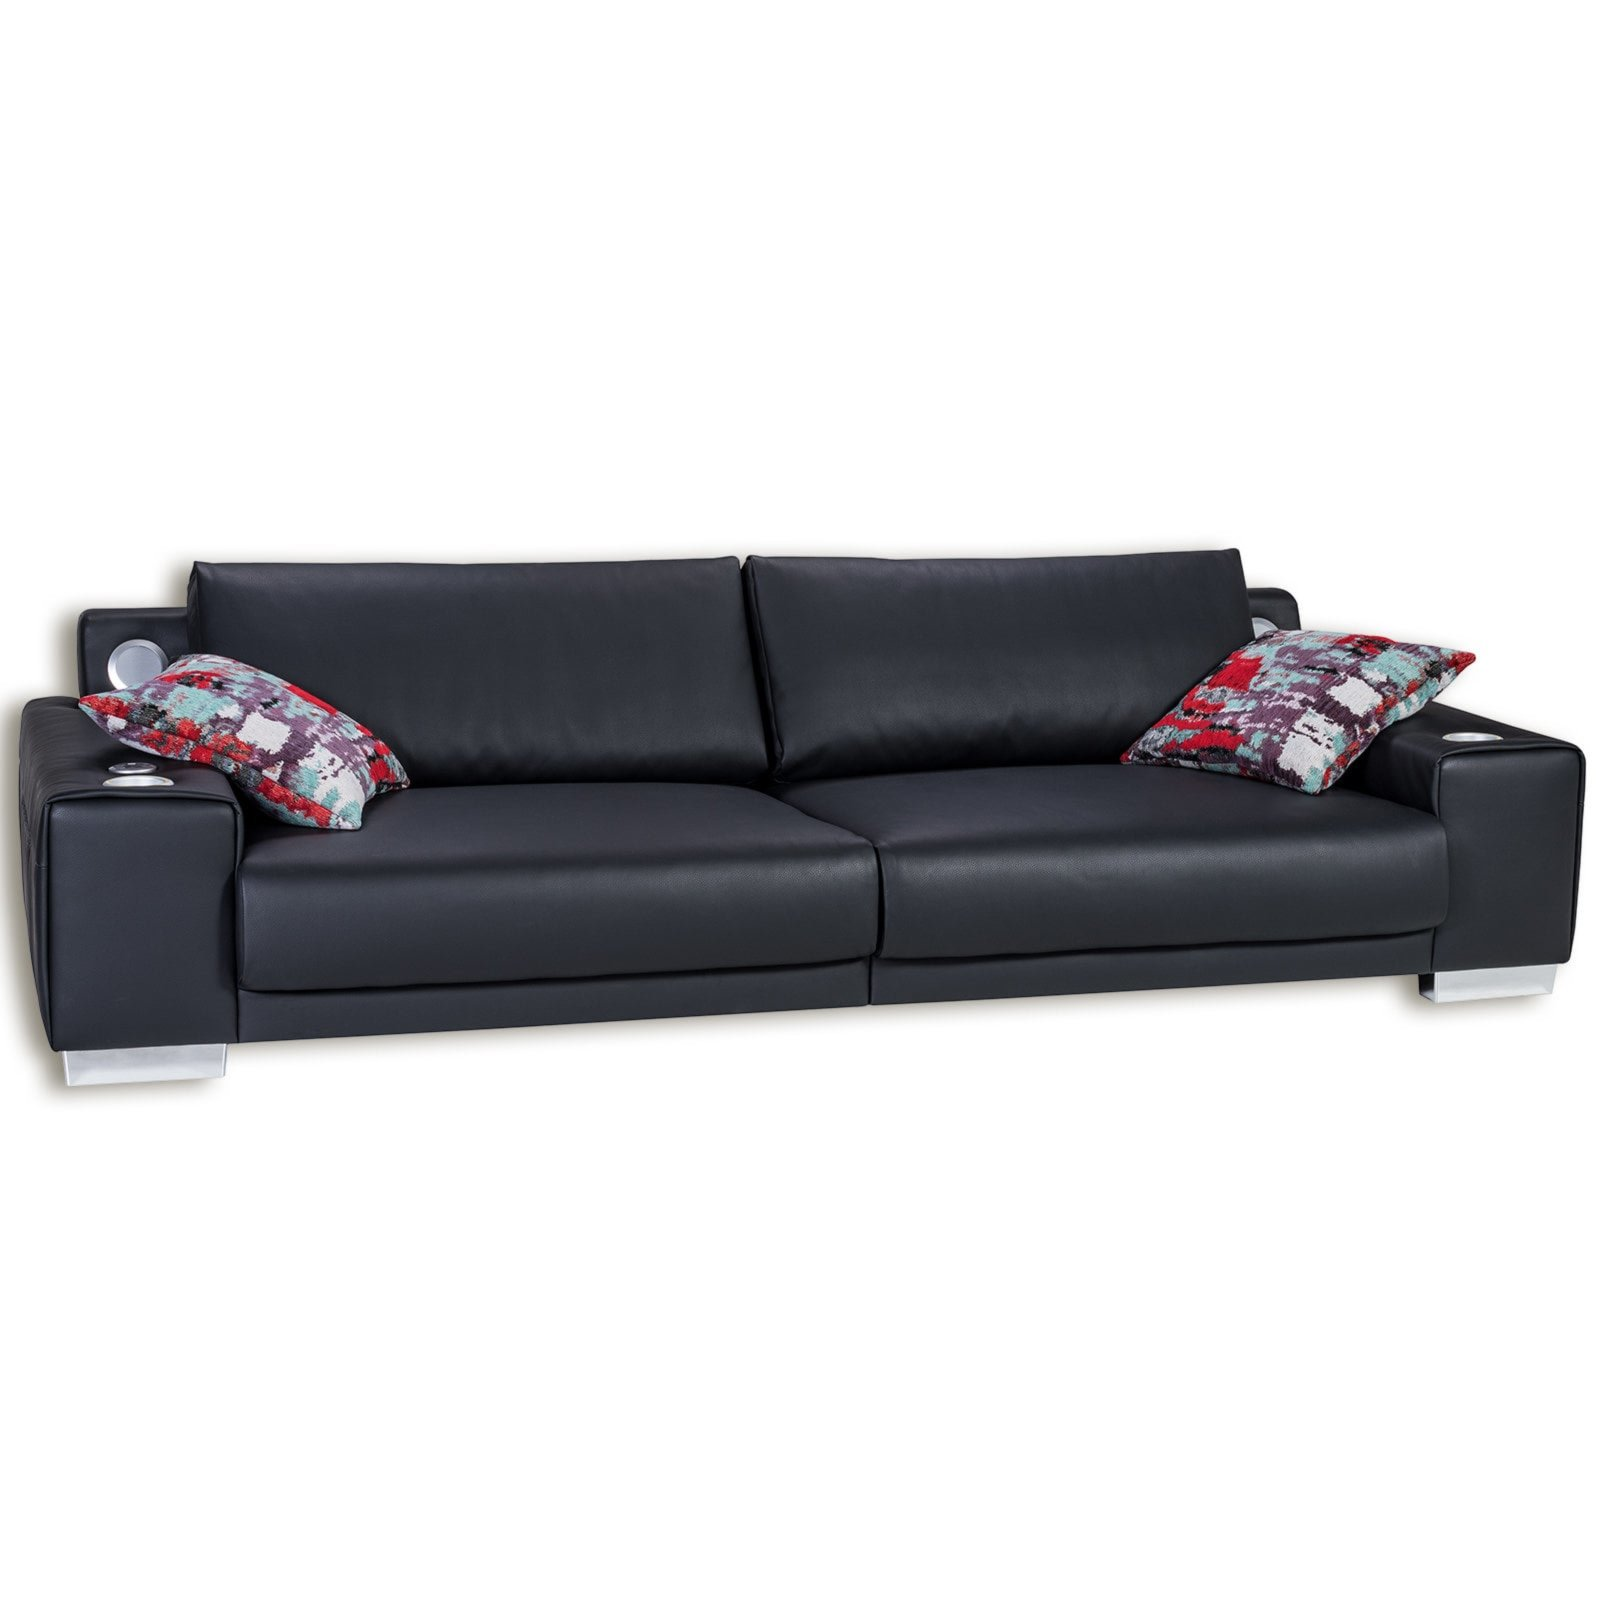 sofa mit soundsystem big sofa mit beleuchtung wahlweise mit bluetooth soundsystem auf raten. Black Bedroom Furniture Sets. Home Design Ideas